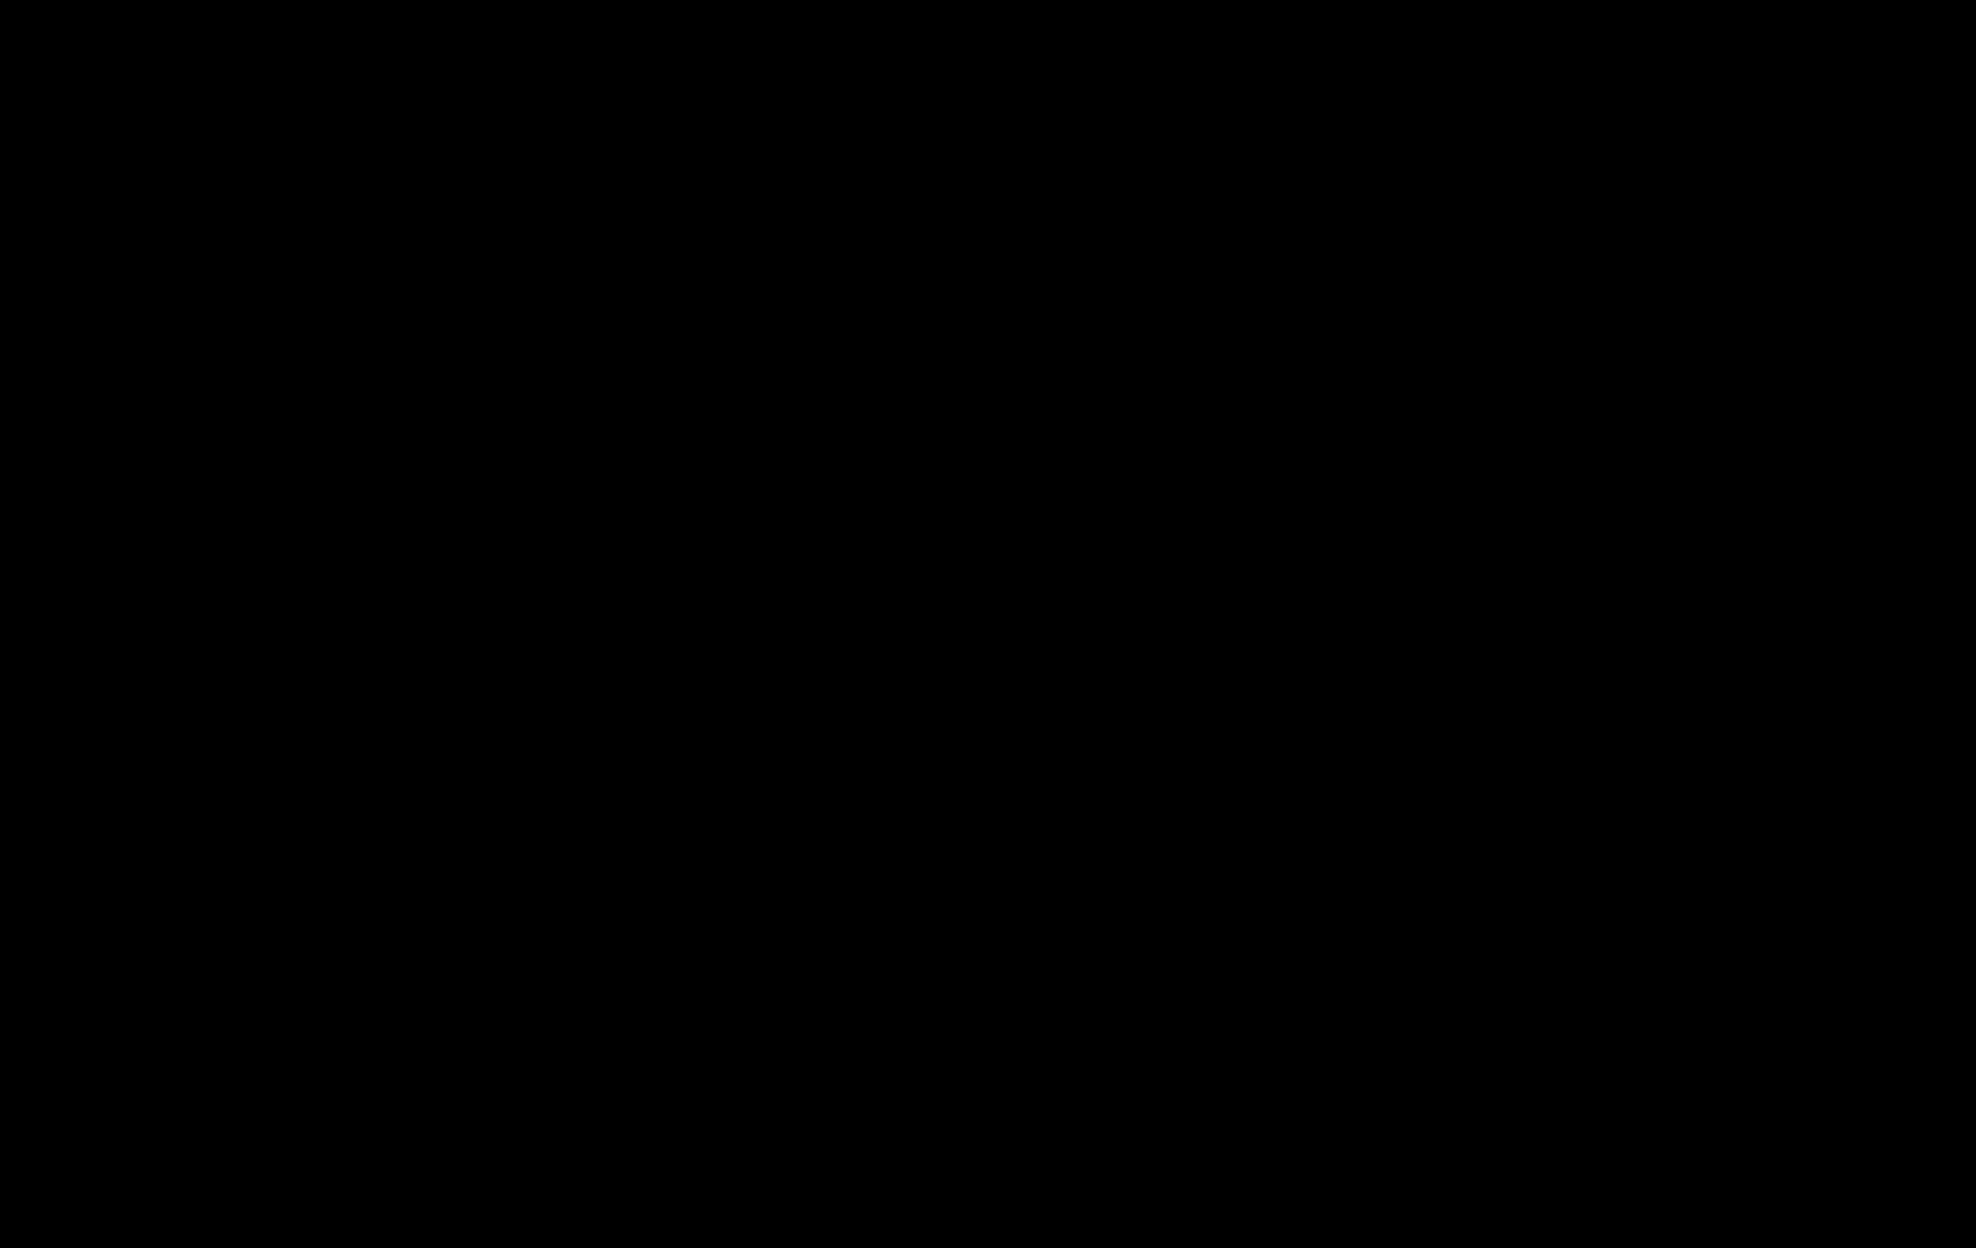 champions league logo png uefa champions league logo png uefa europa league 1073561 vippng uefa champions league logo png